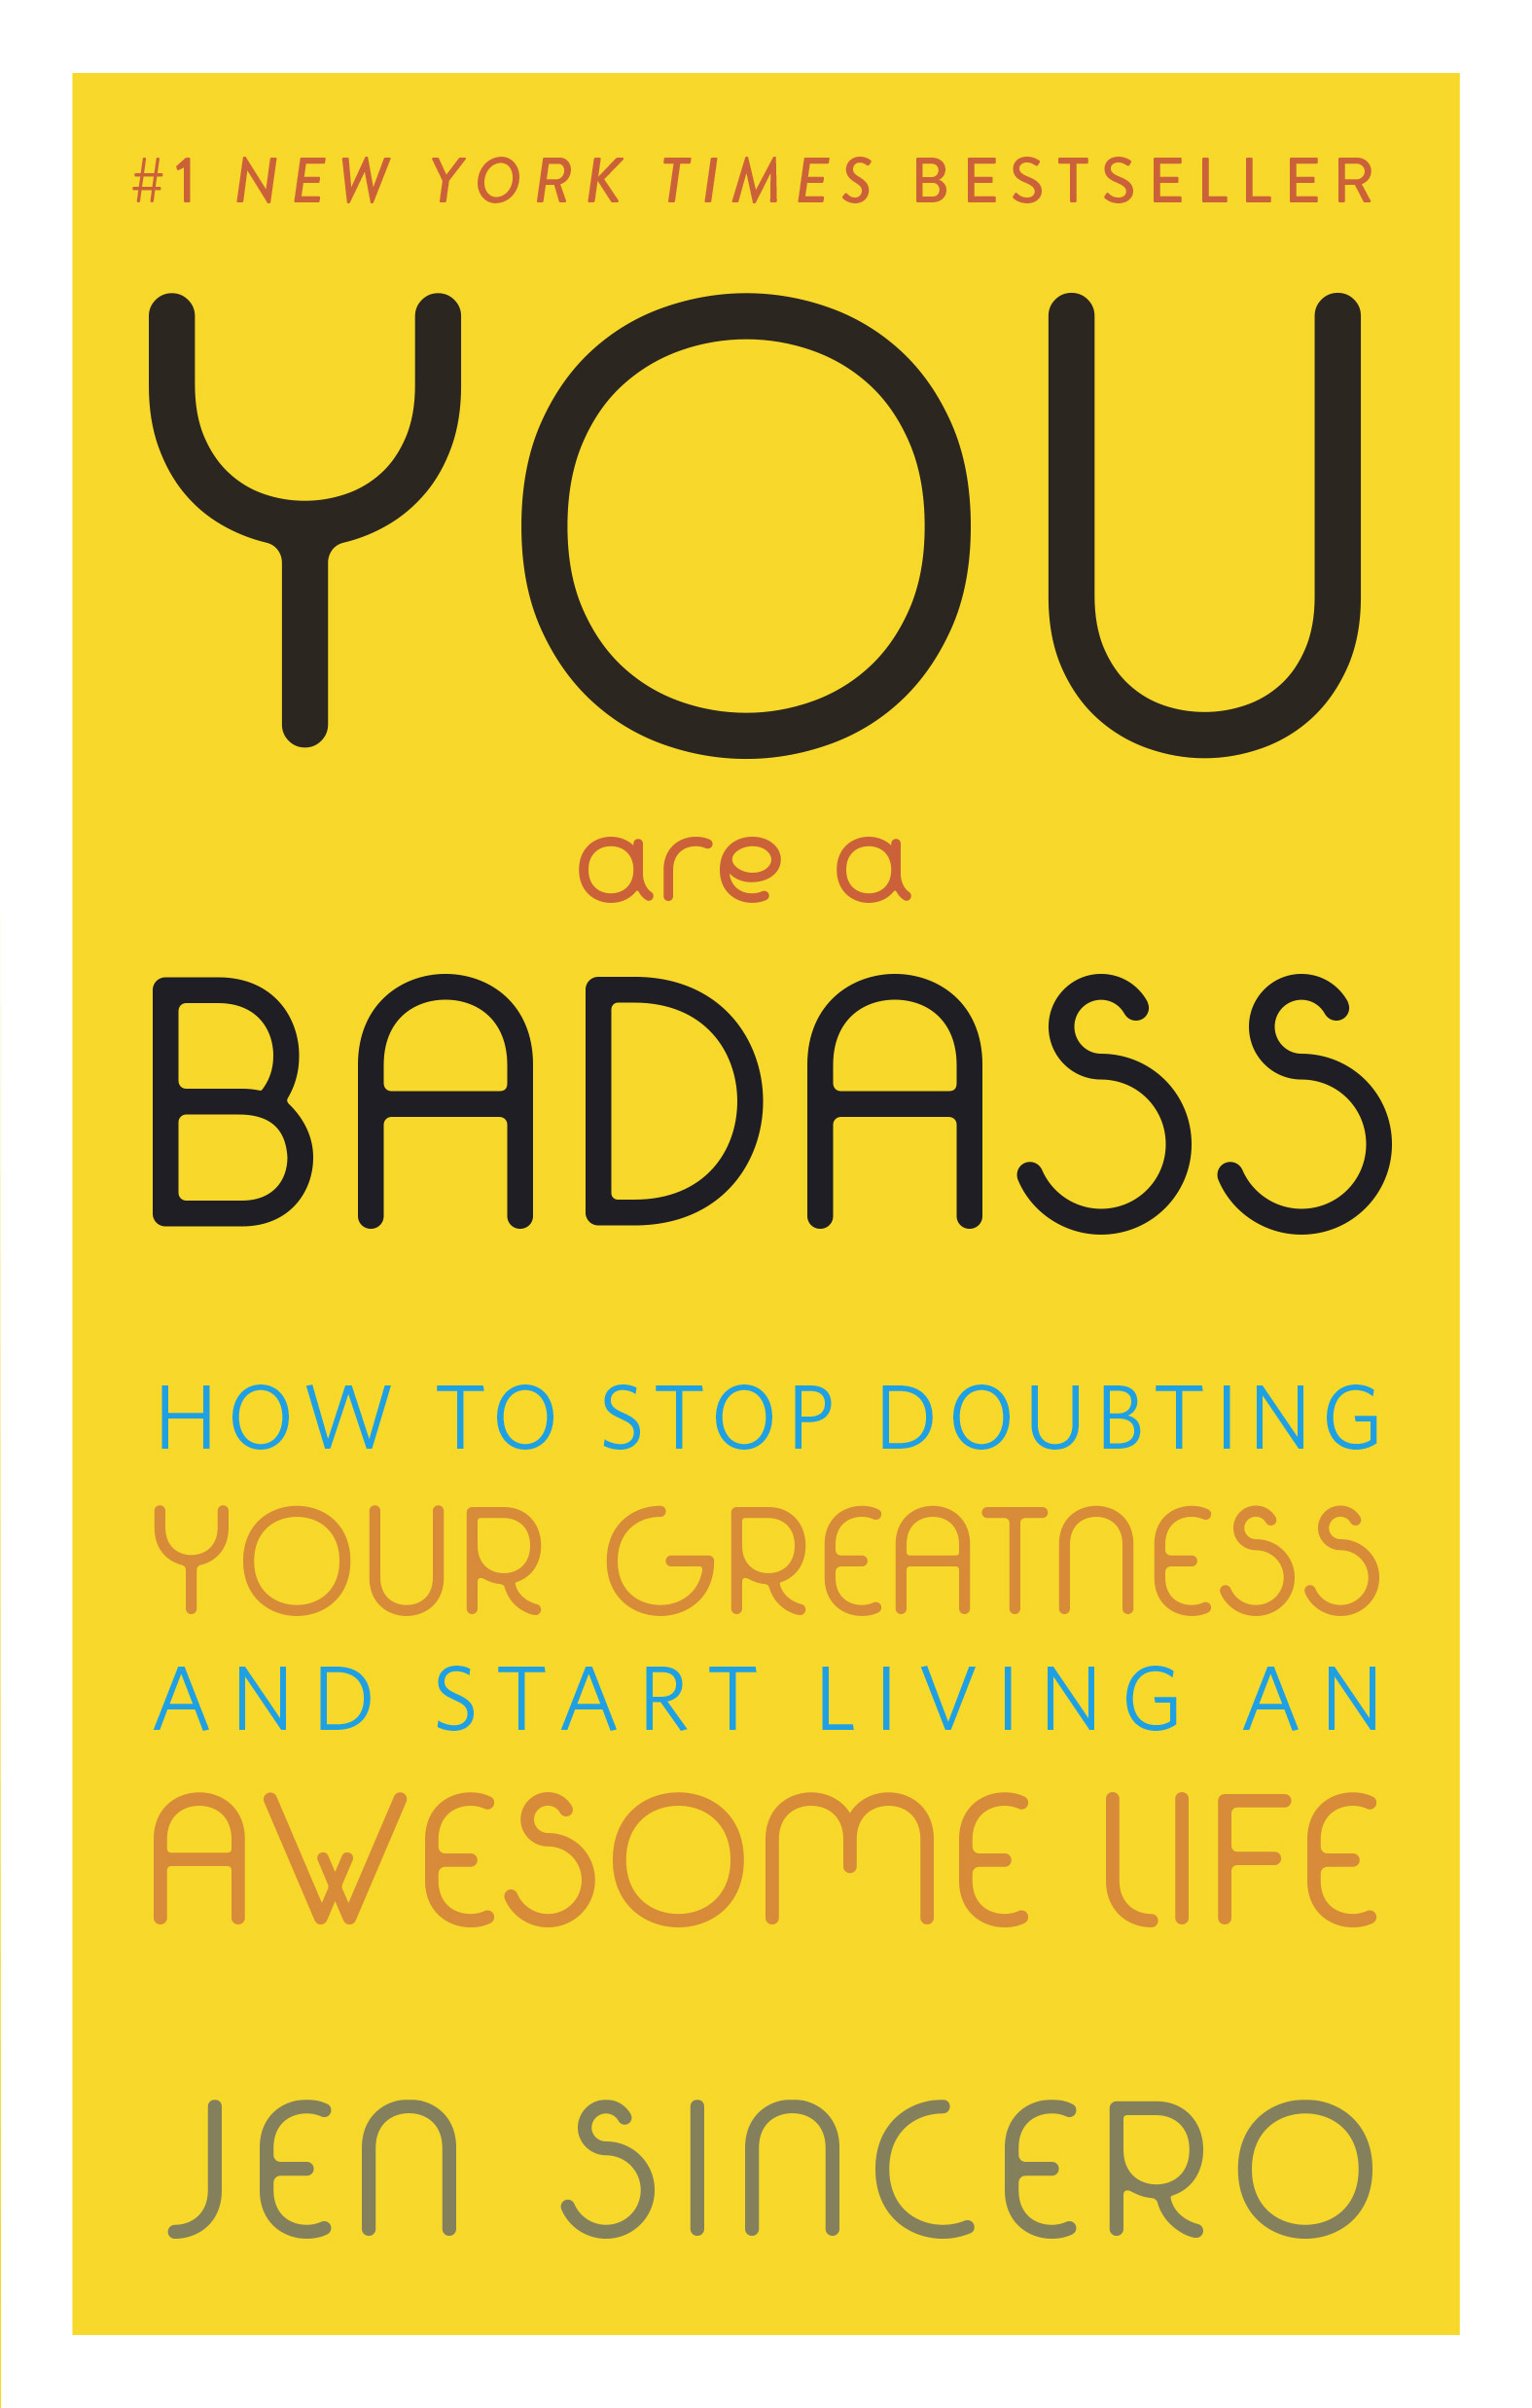 erica-castner-week-4-you-are-a-badass-book